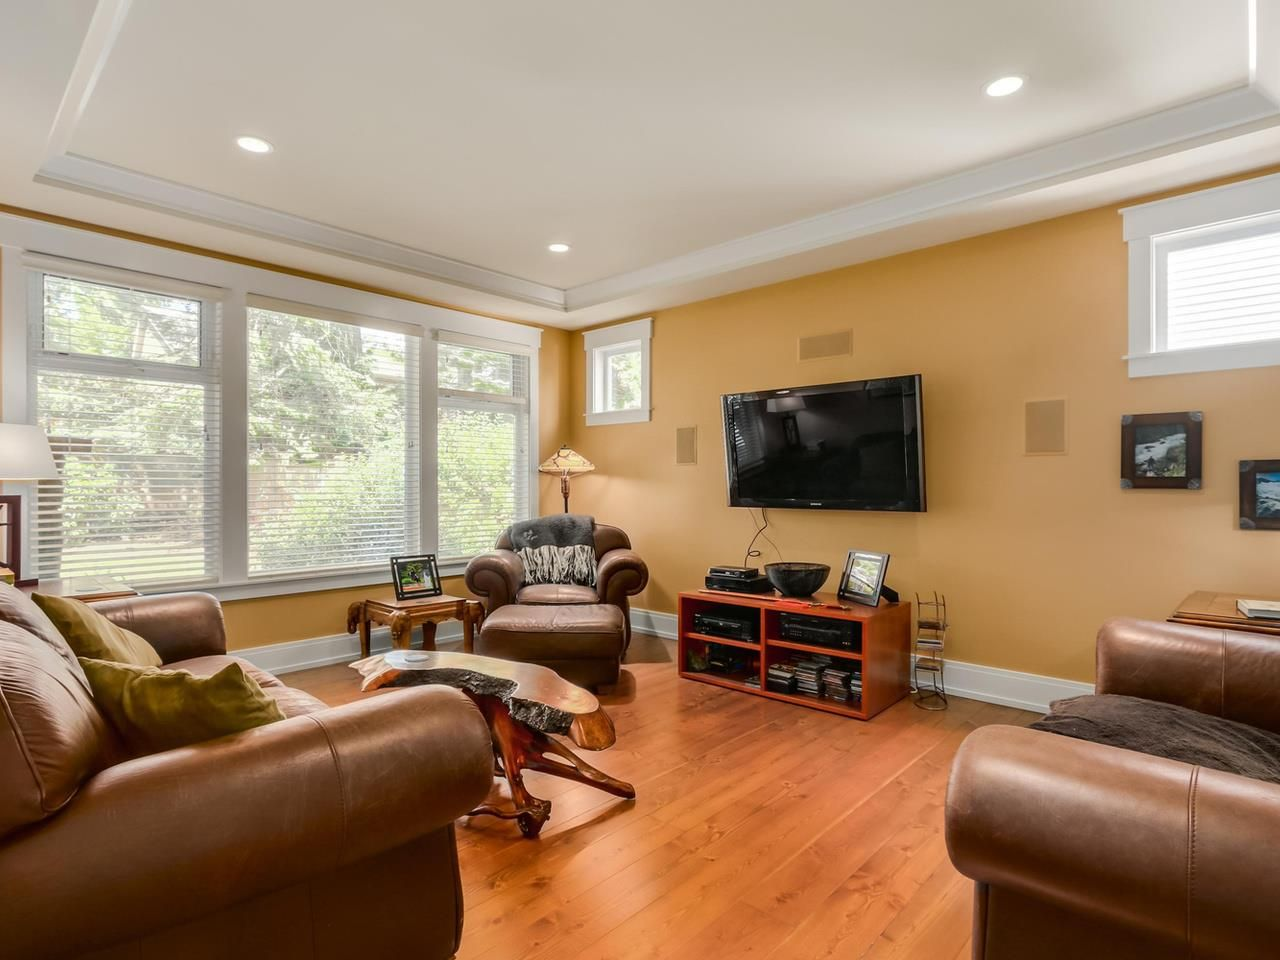 Photo 8: Photos: 13029 14 Avenue in Surrey: Crescent Bch Ocean Pk. House for sale (South Surrey White Rock)  : MLS®# R2070160